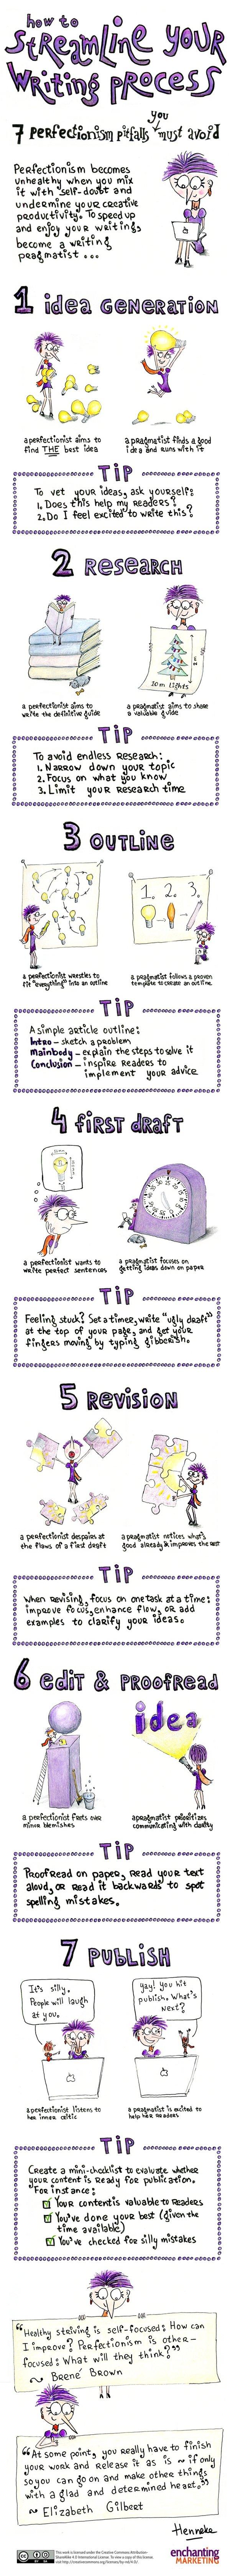 writing-process-infographic.jpg